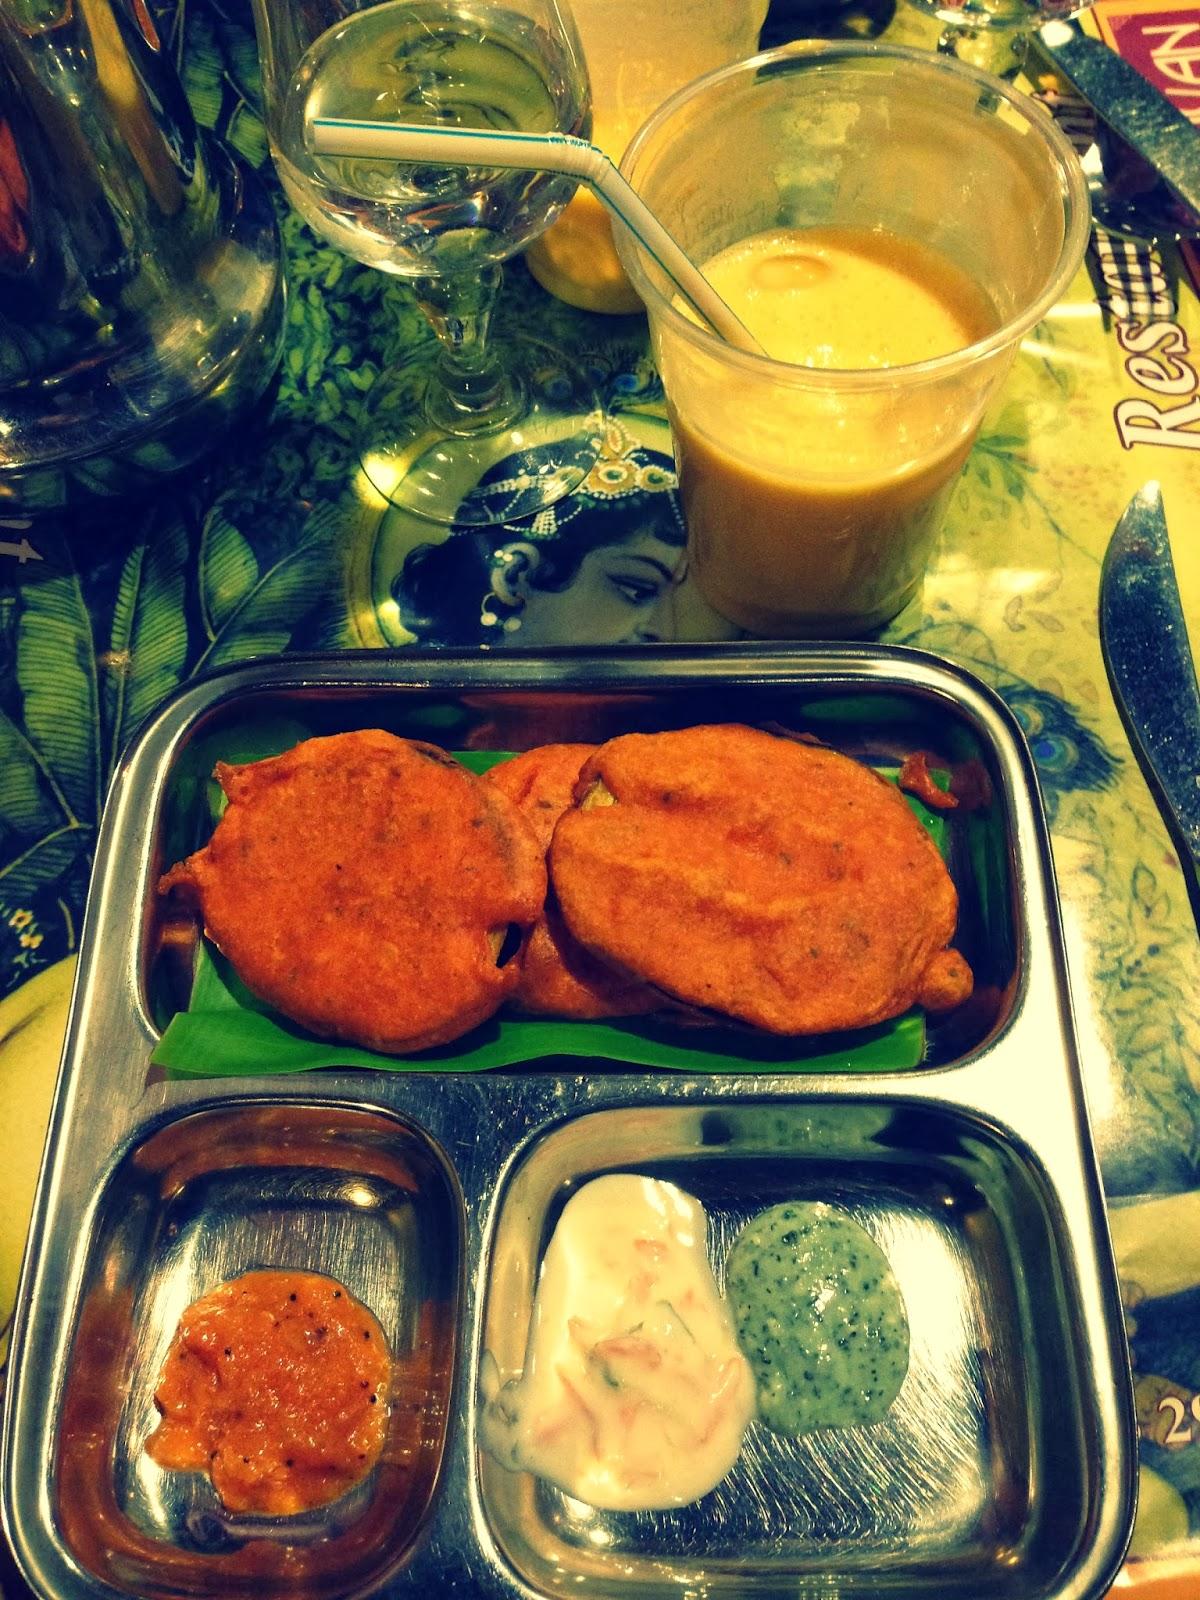 Nidocooking krishna bhavan restaurant v g tarien for Krishna bhavan paris